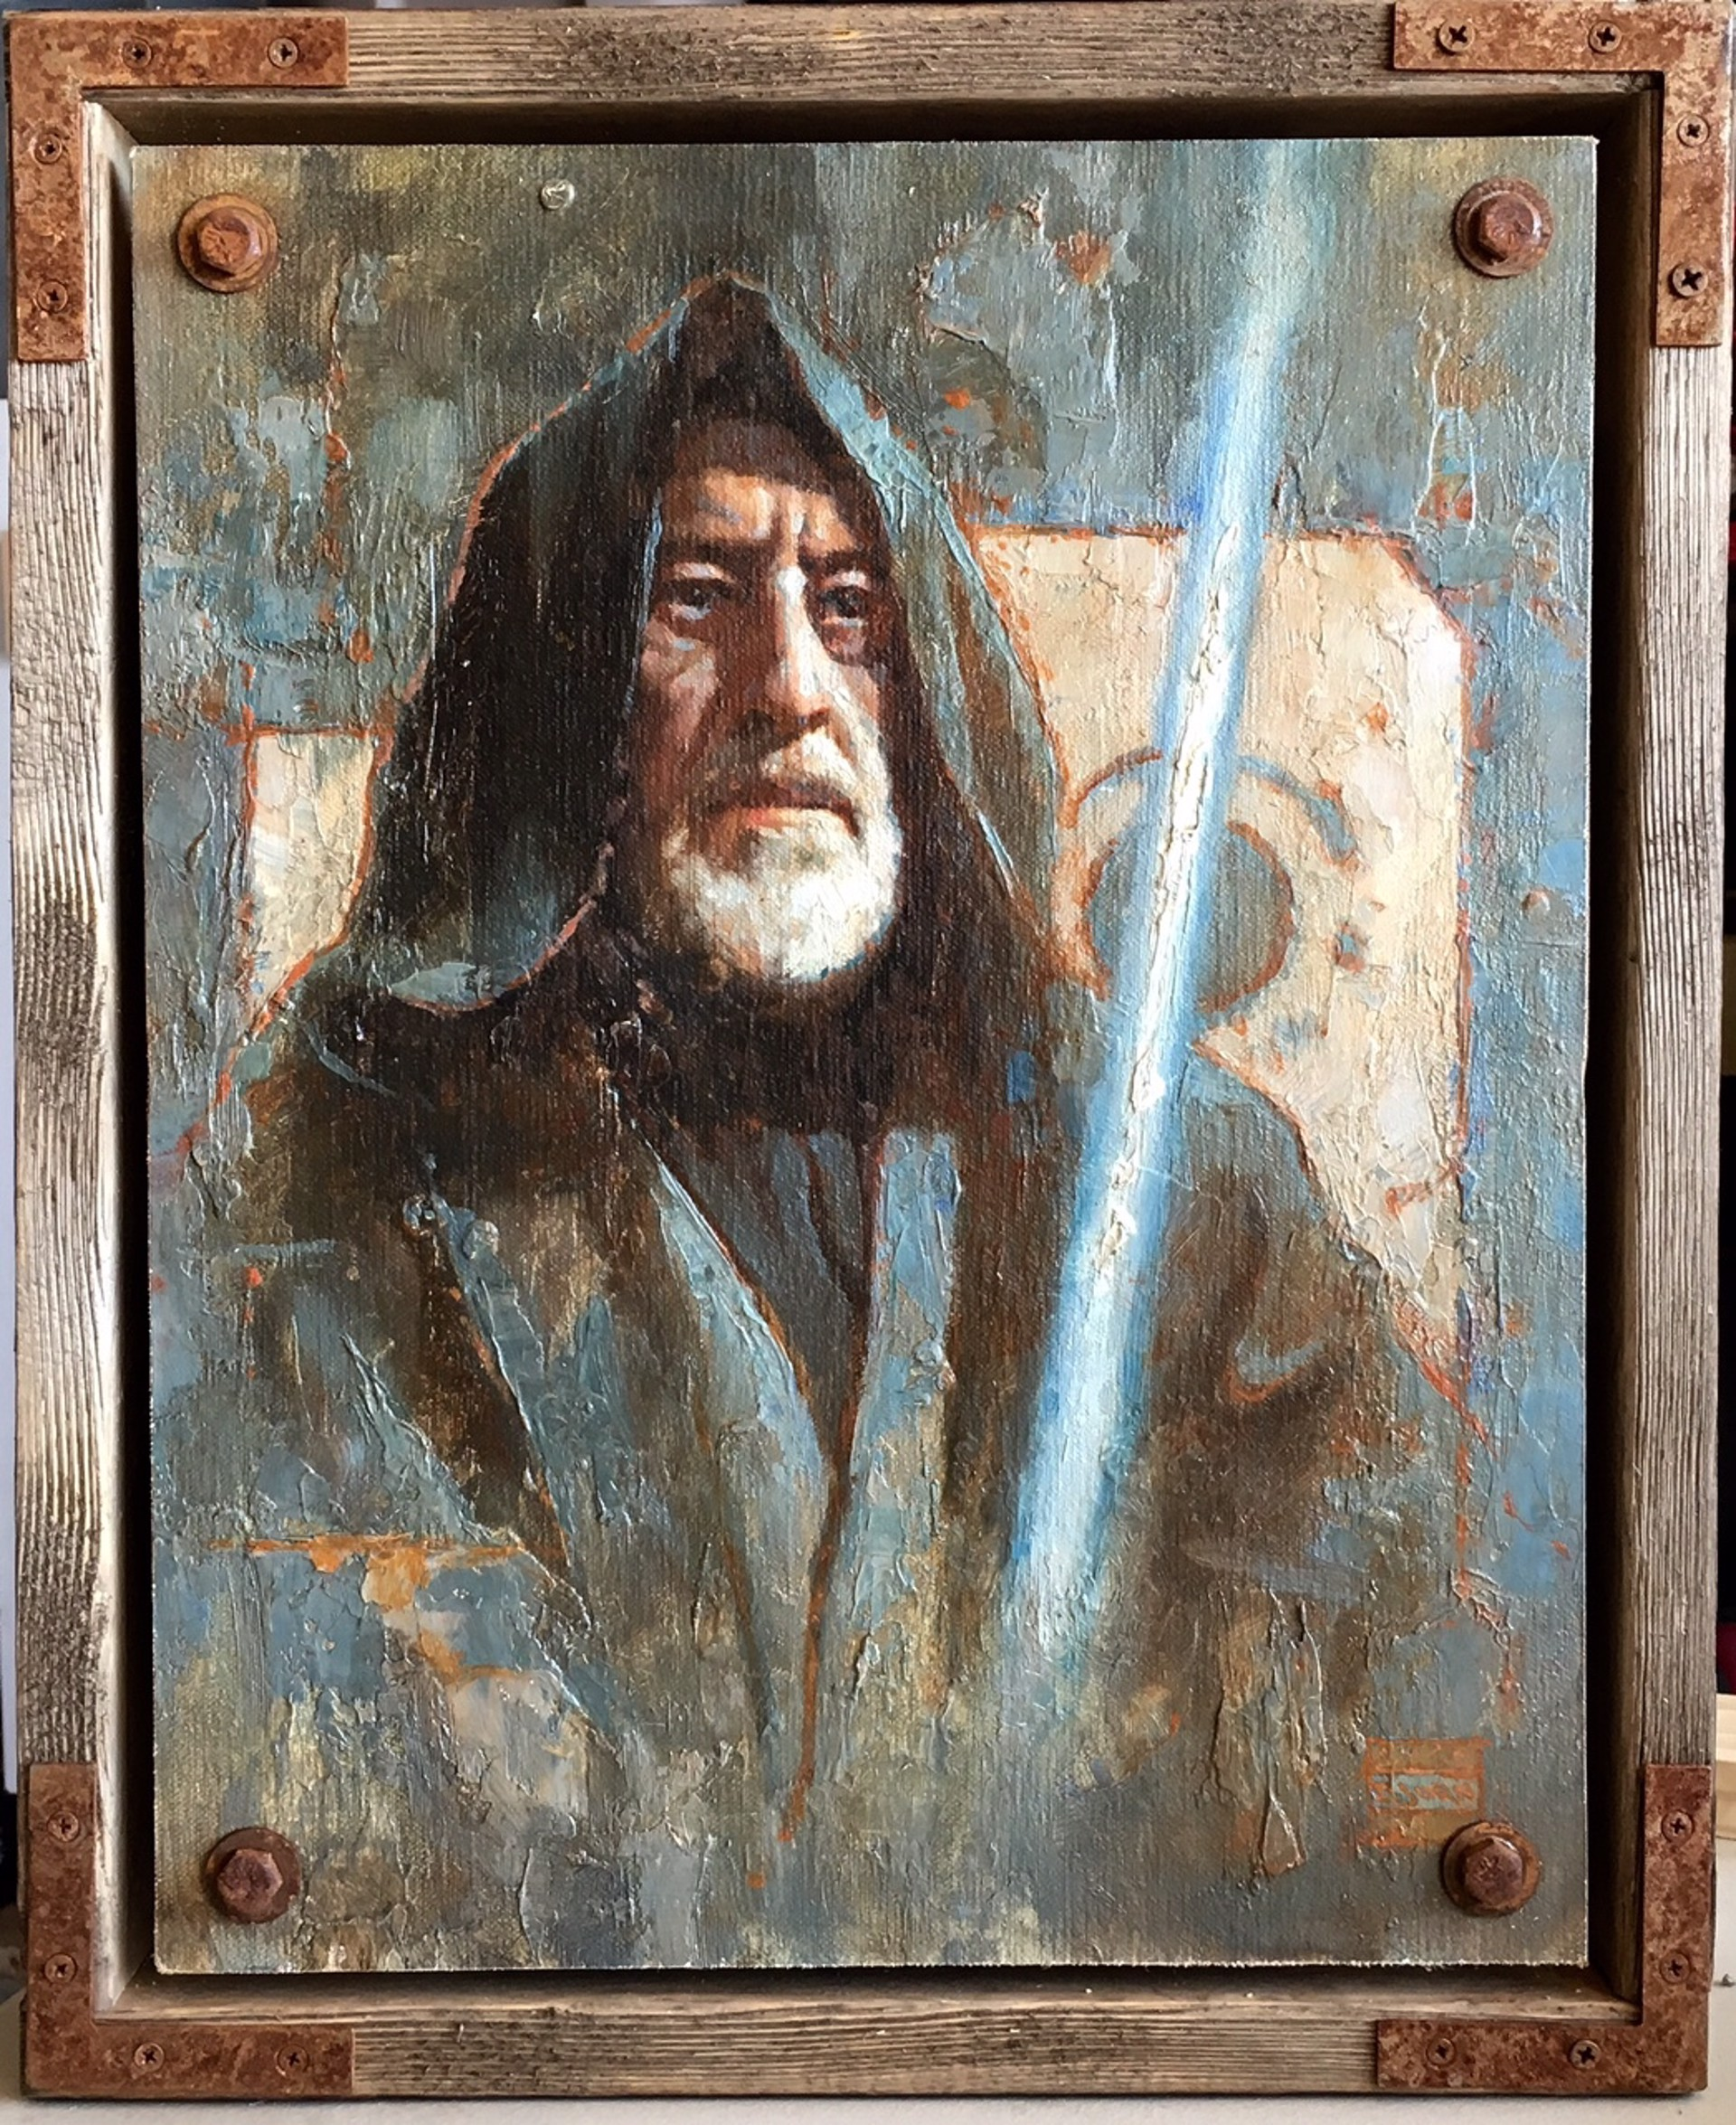 Obi-Wan by Bjorn Thorkelson